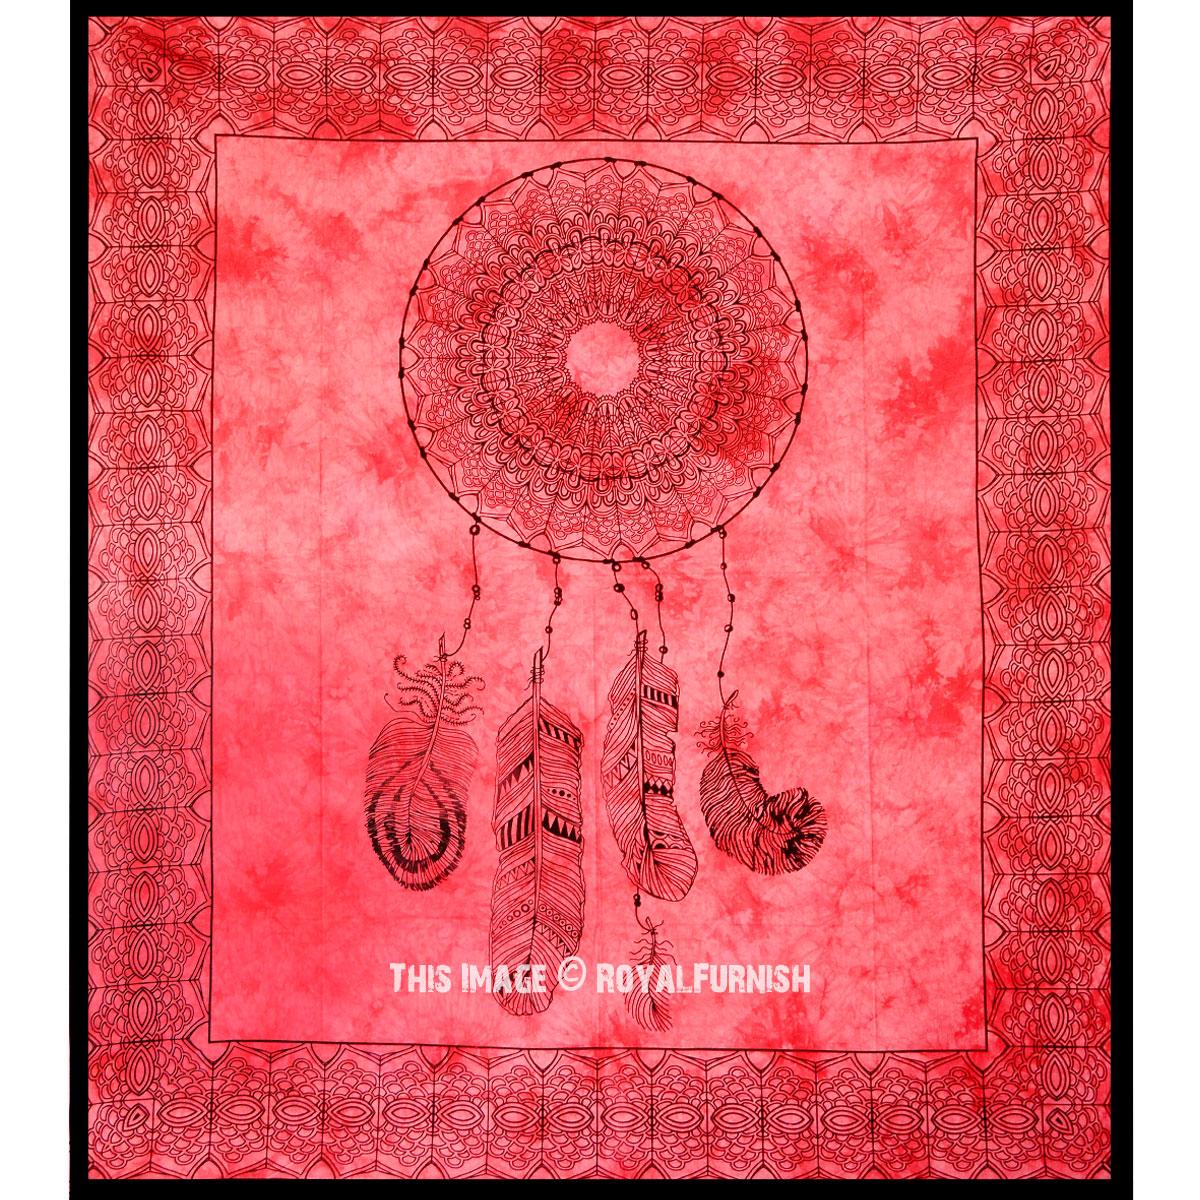 Red Dream Catcher Tapestry - RoyalFurnish.com